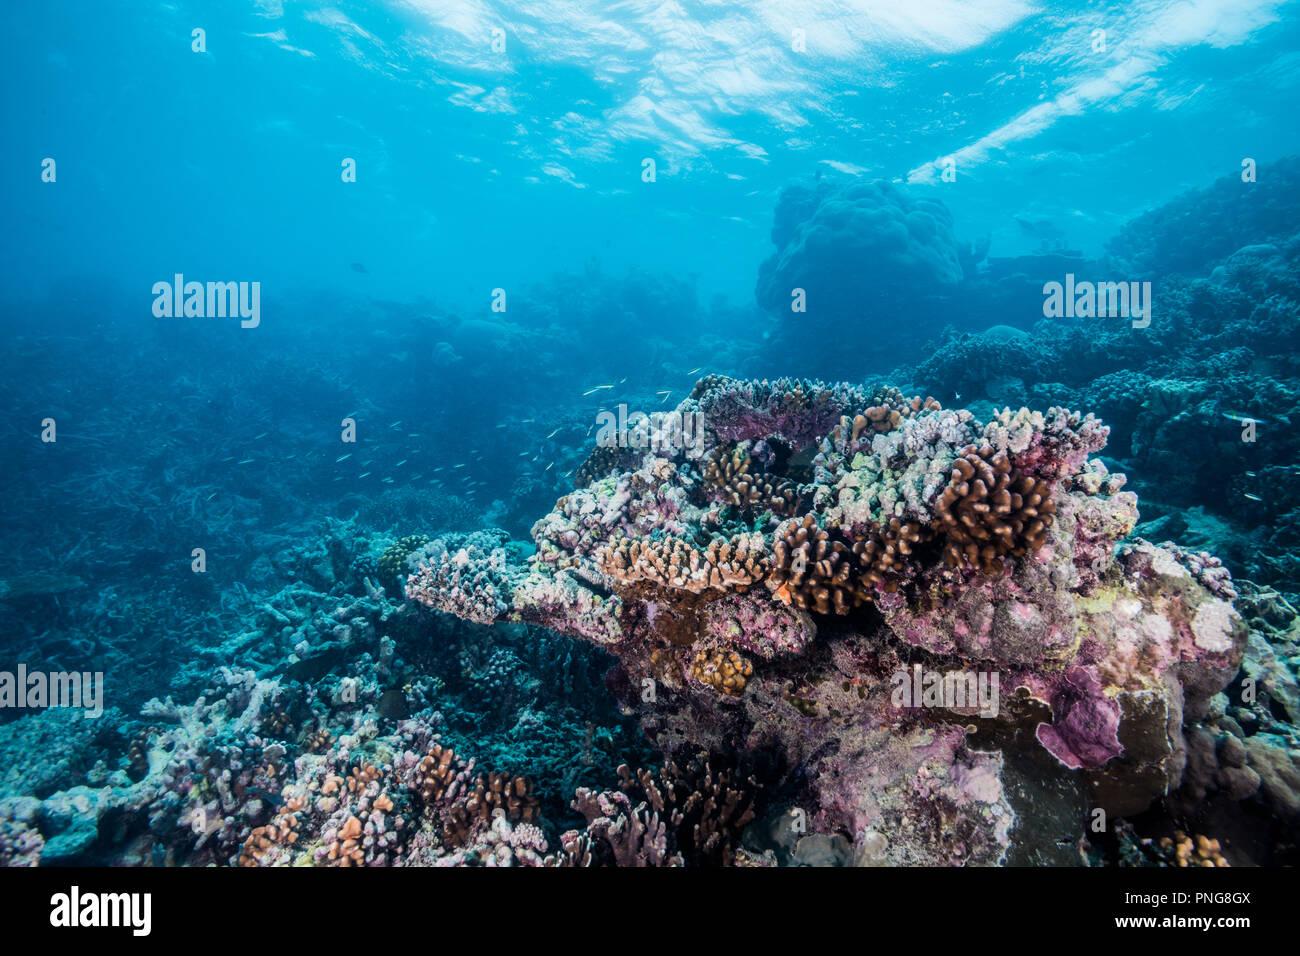 Reef scene Yap Island Federated States of Micronesia - Stock Image